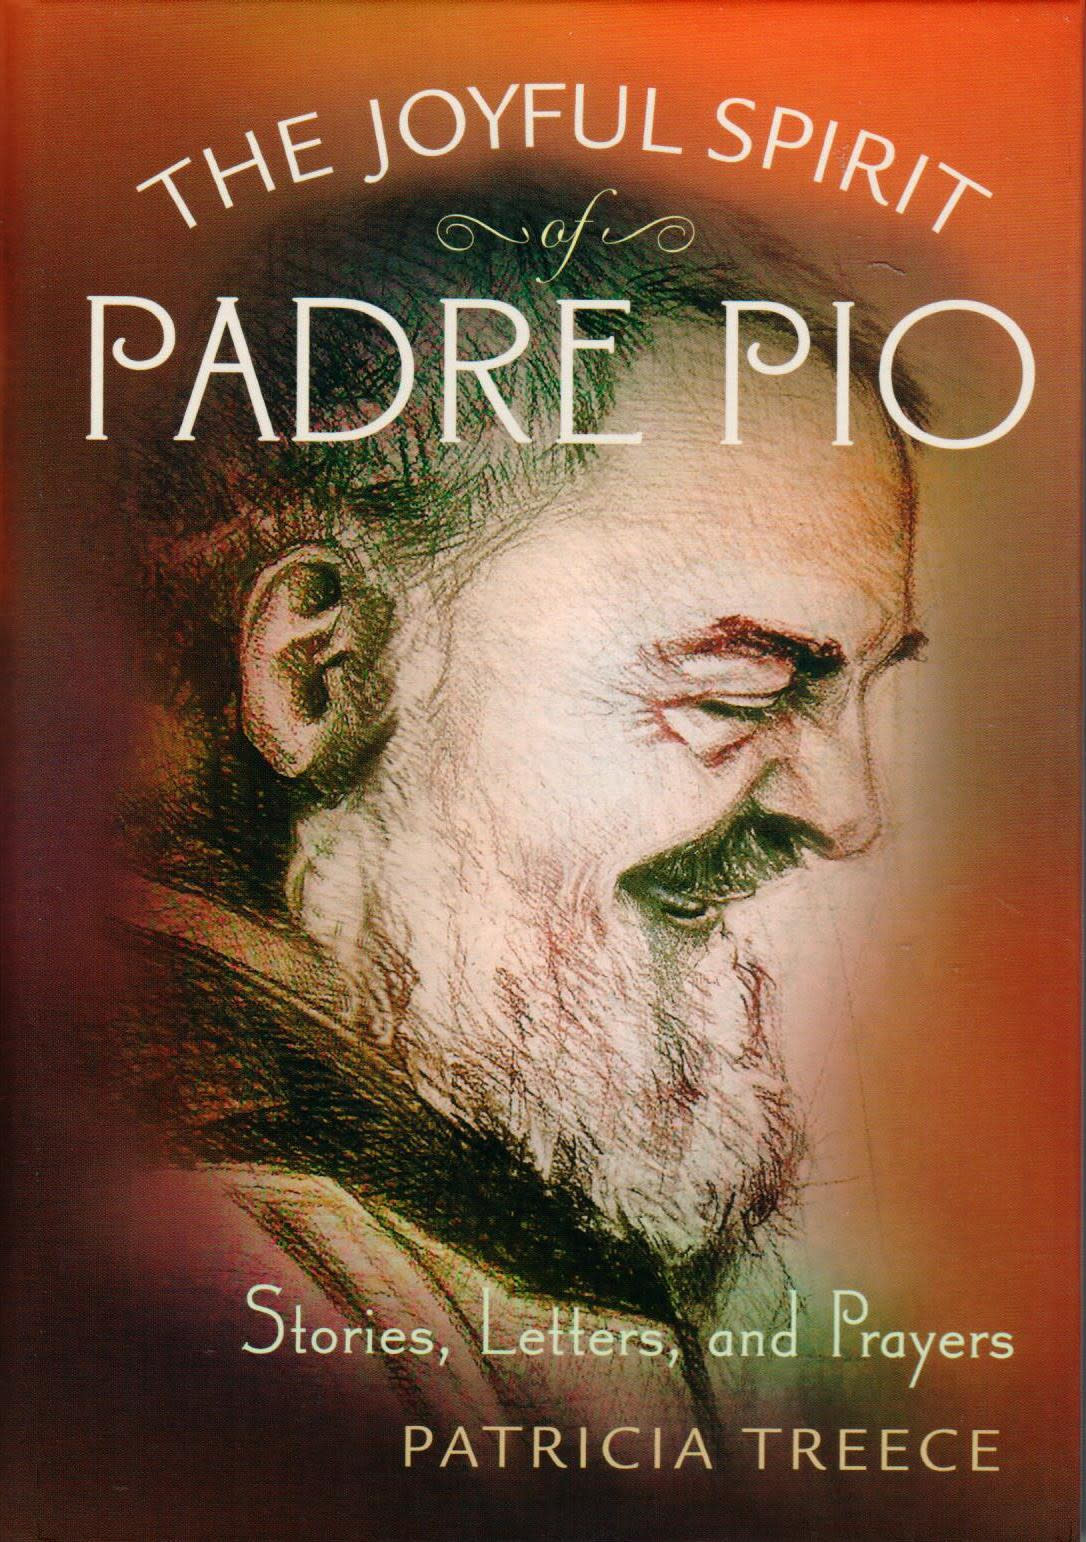 The Joyful Spirit of Padre Pio: Stories, Letters, and Prayers